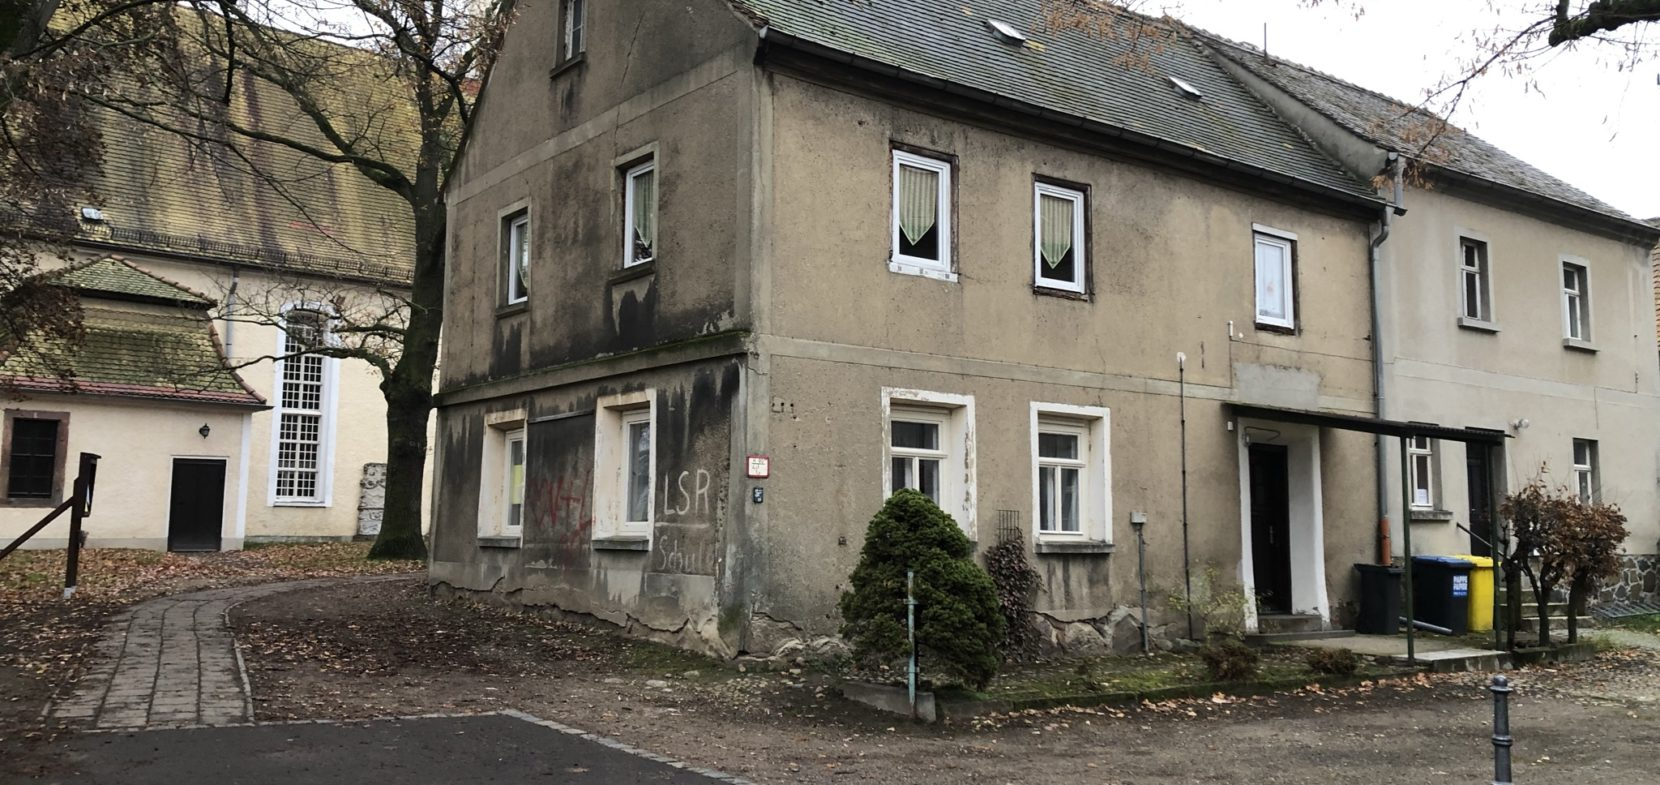 Kantorat Lindenthal